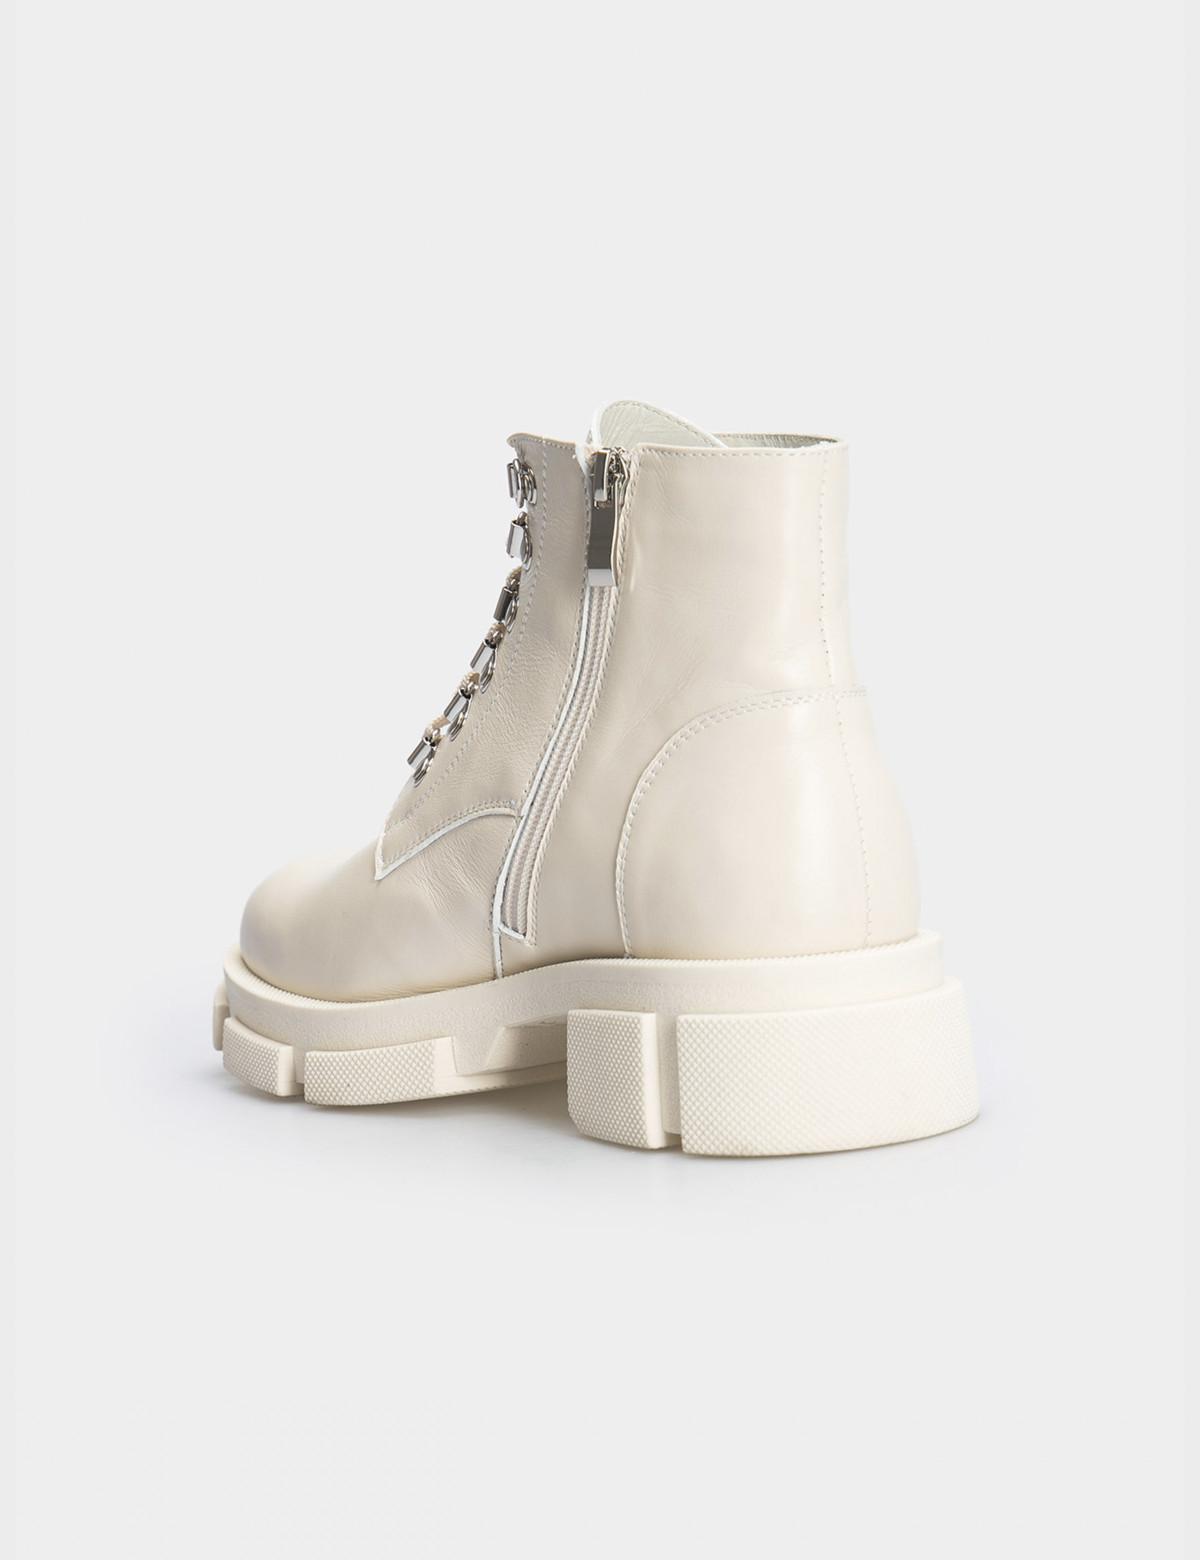 Ботинки бежевые. Натуральная кожа. Байка2